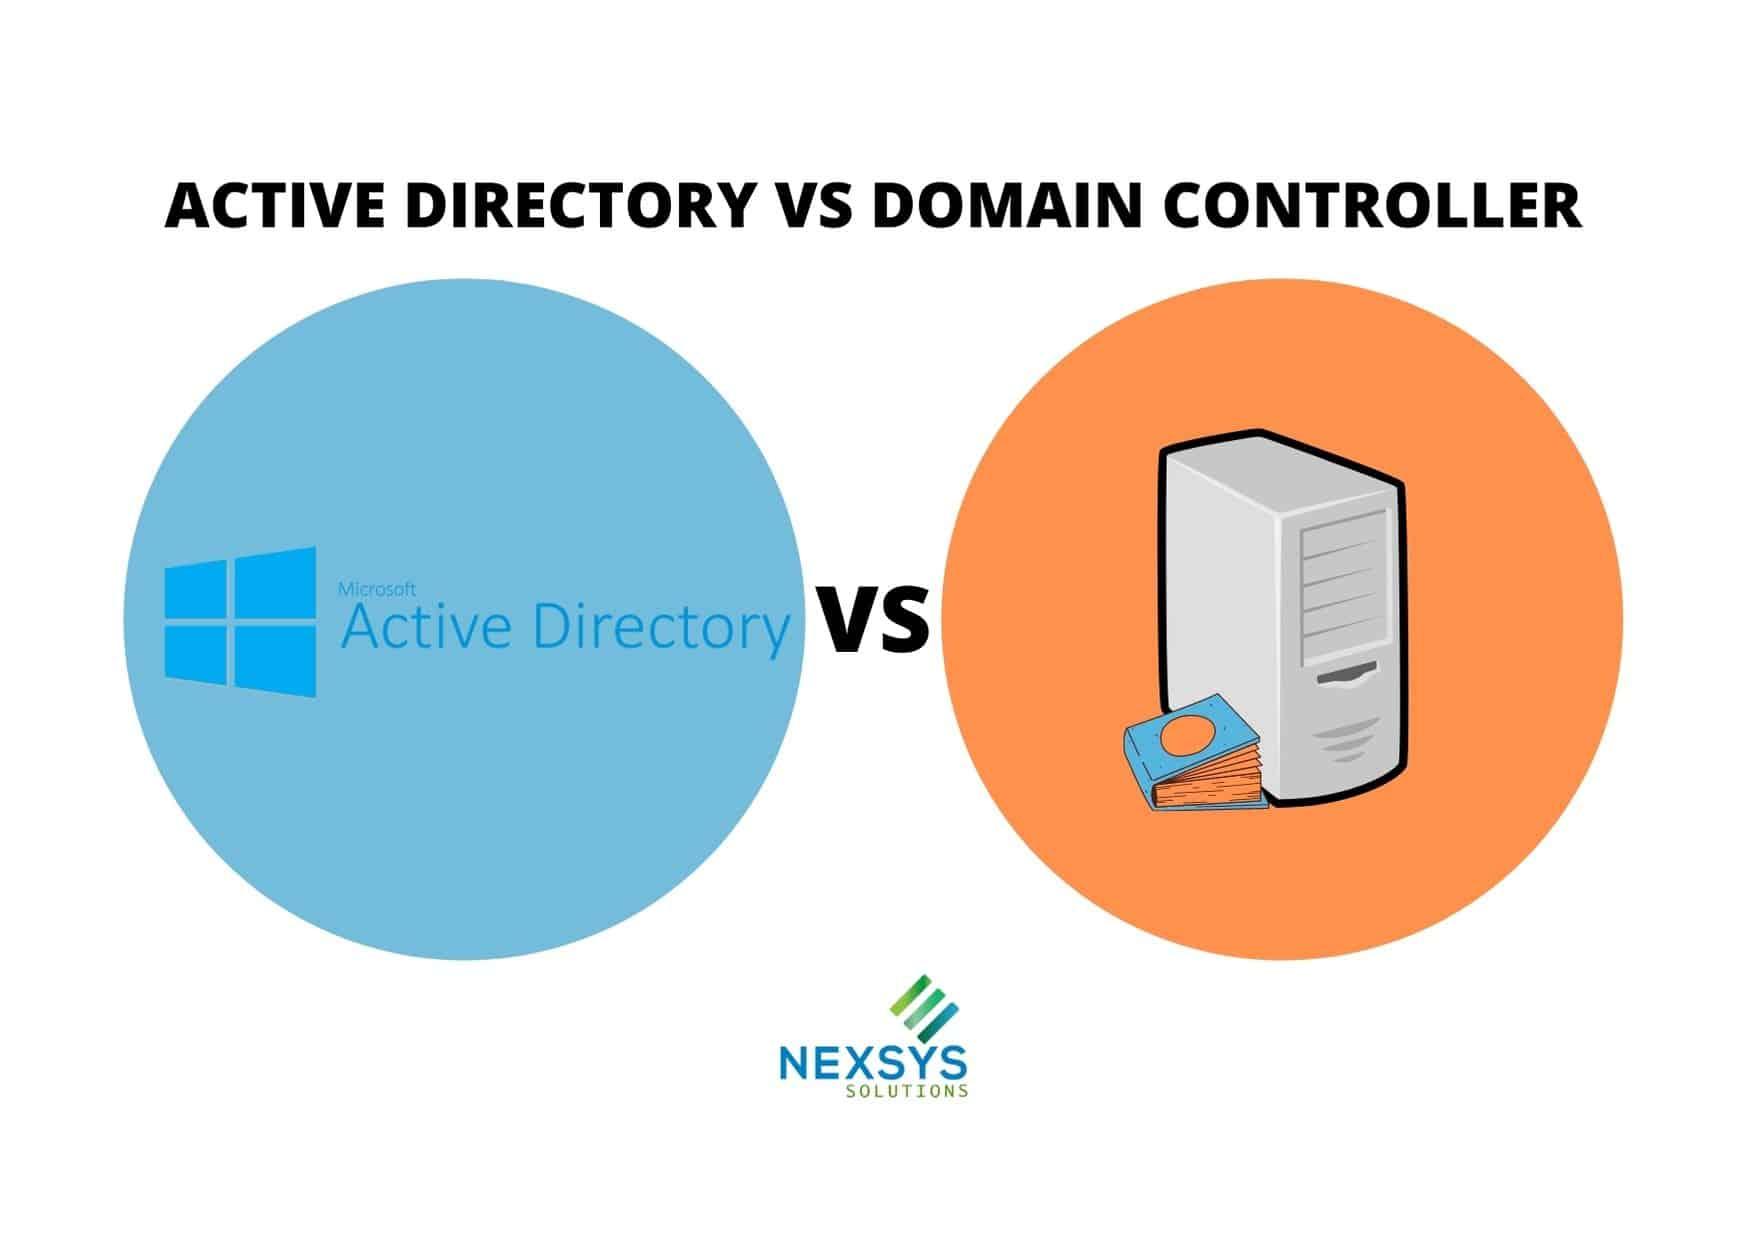 ACTIVE DIRECTORY VS DOMAIN CONTROLLER